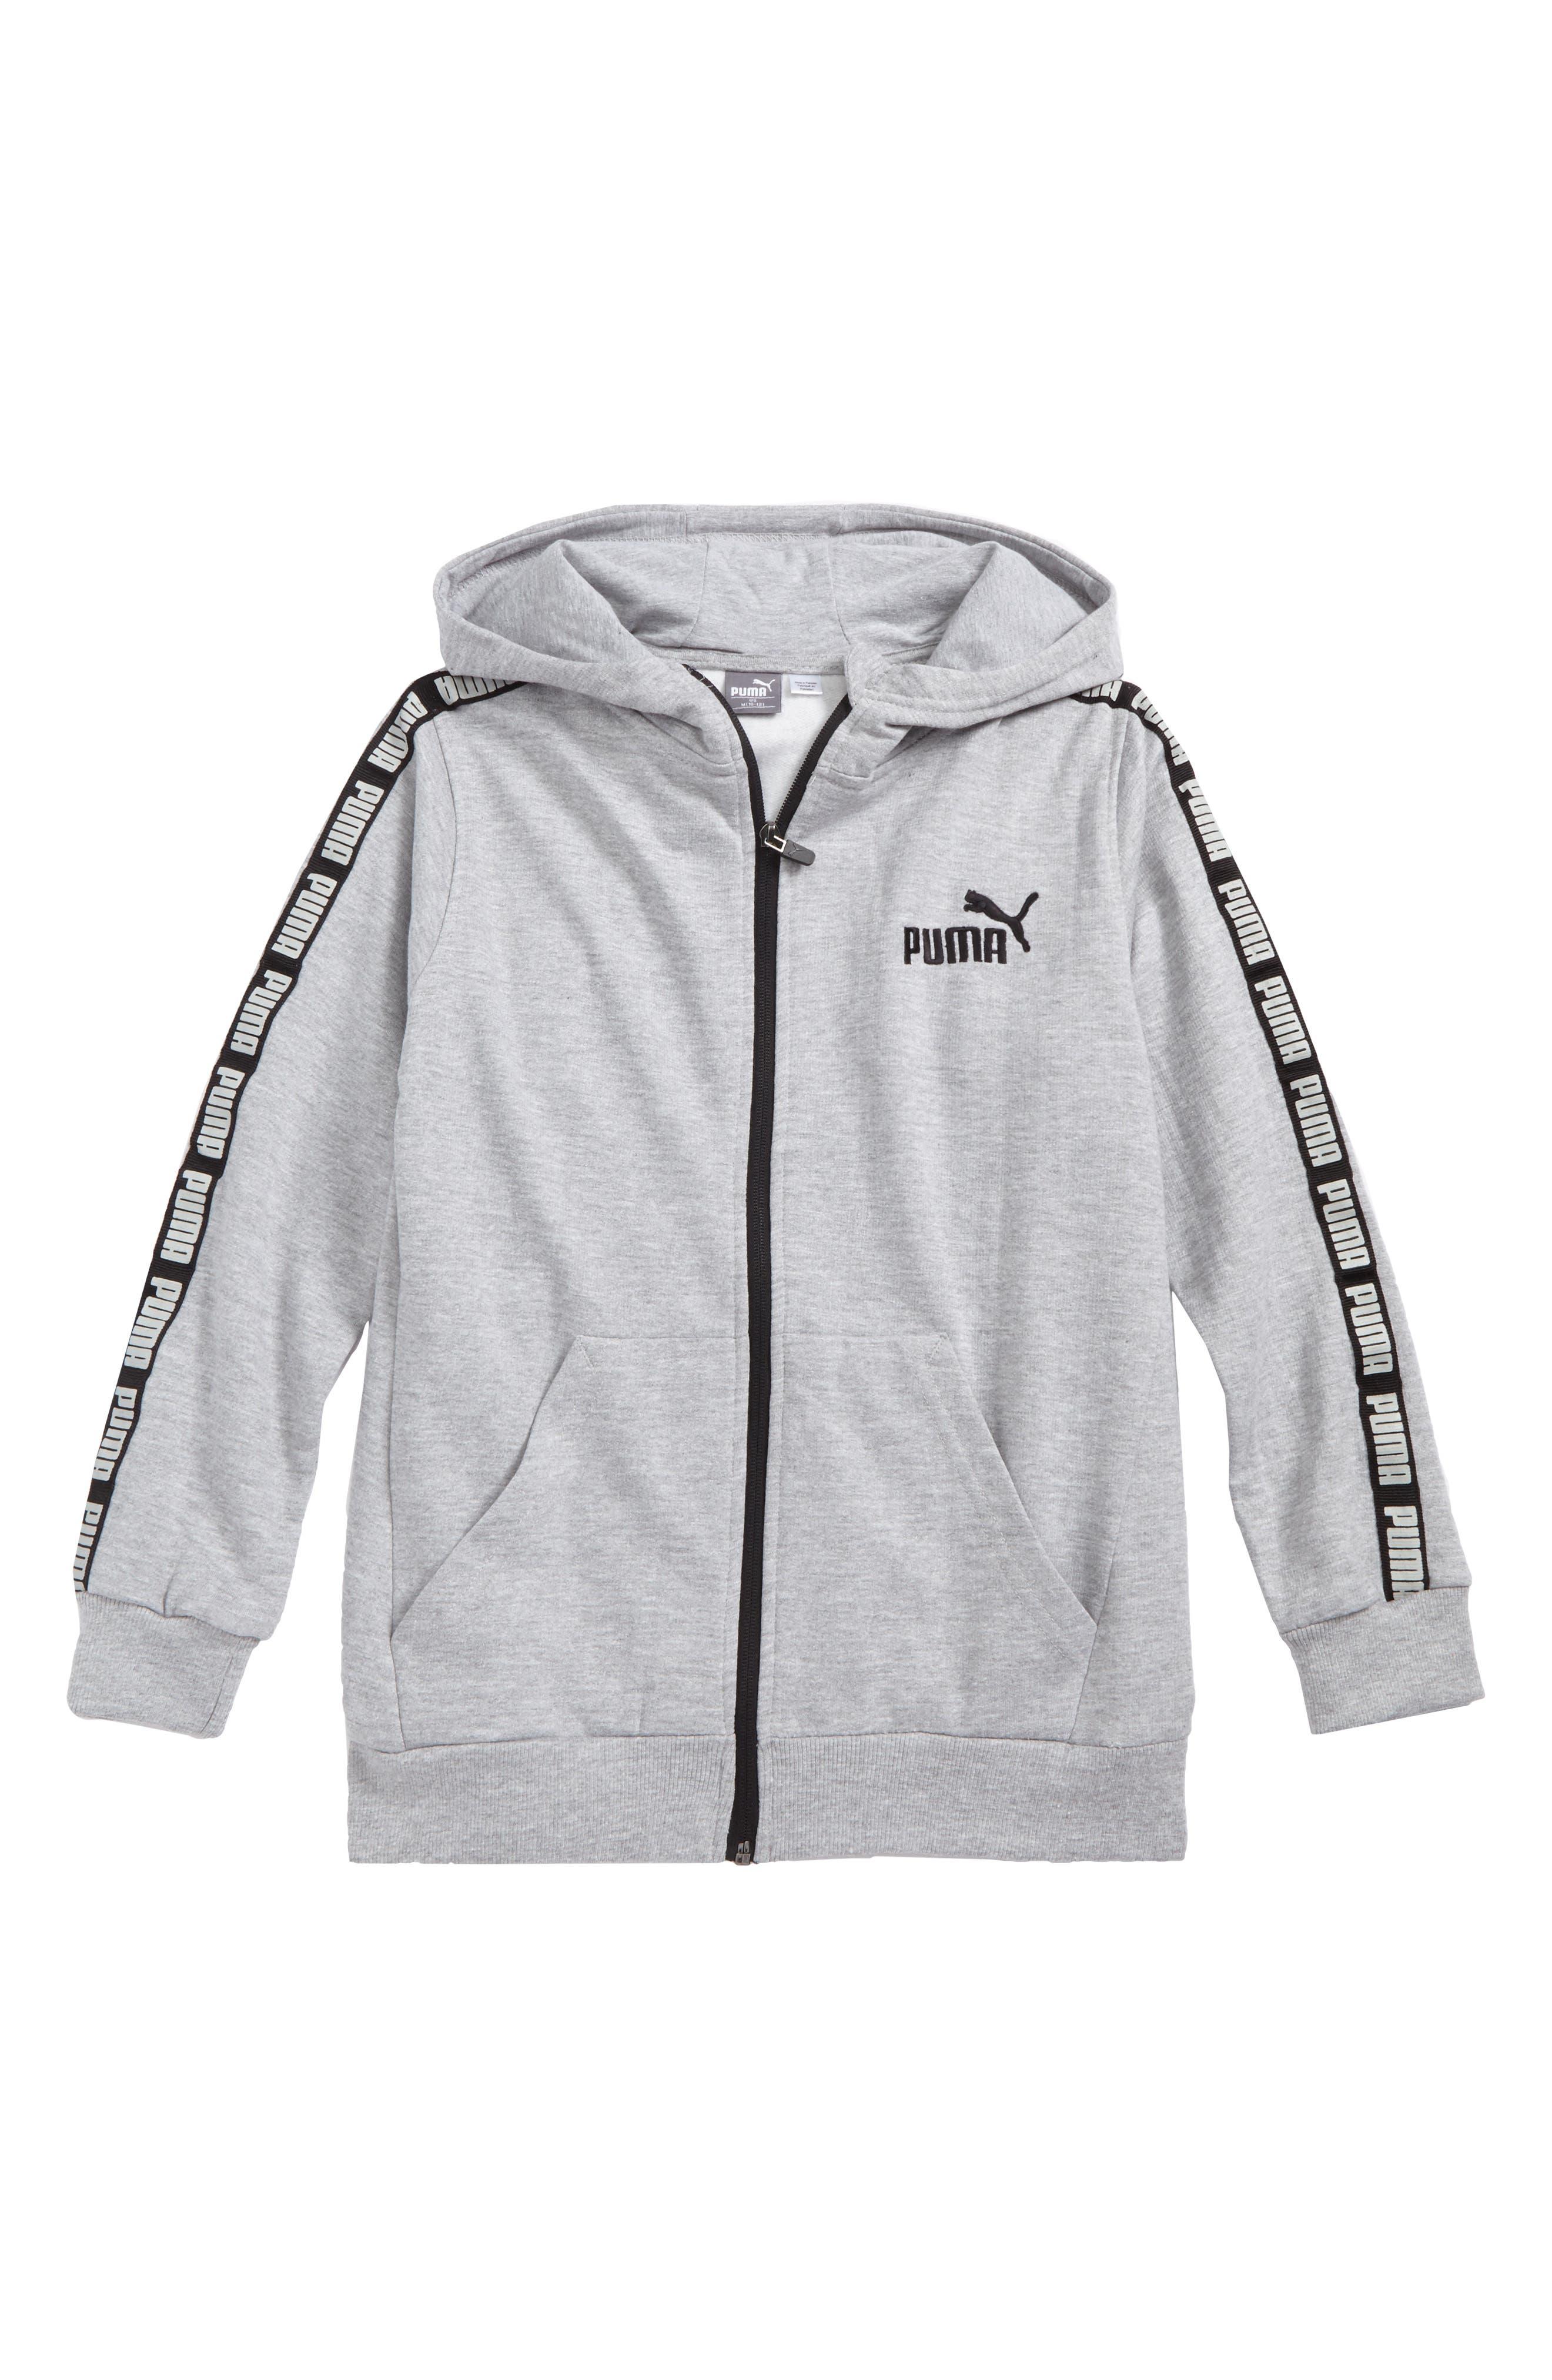 Puma Graphic Zip Hoodie (Big Boys)